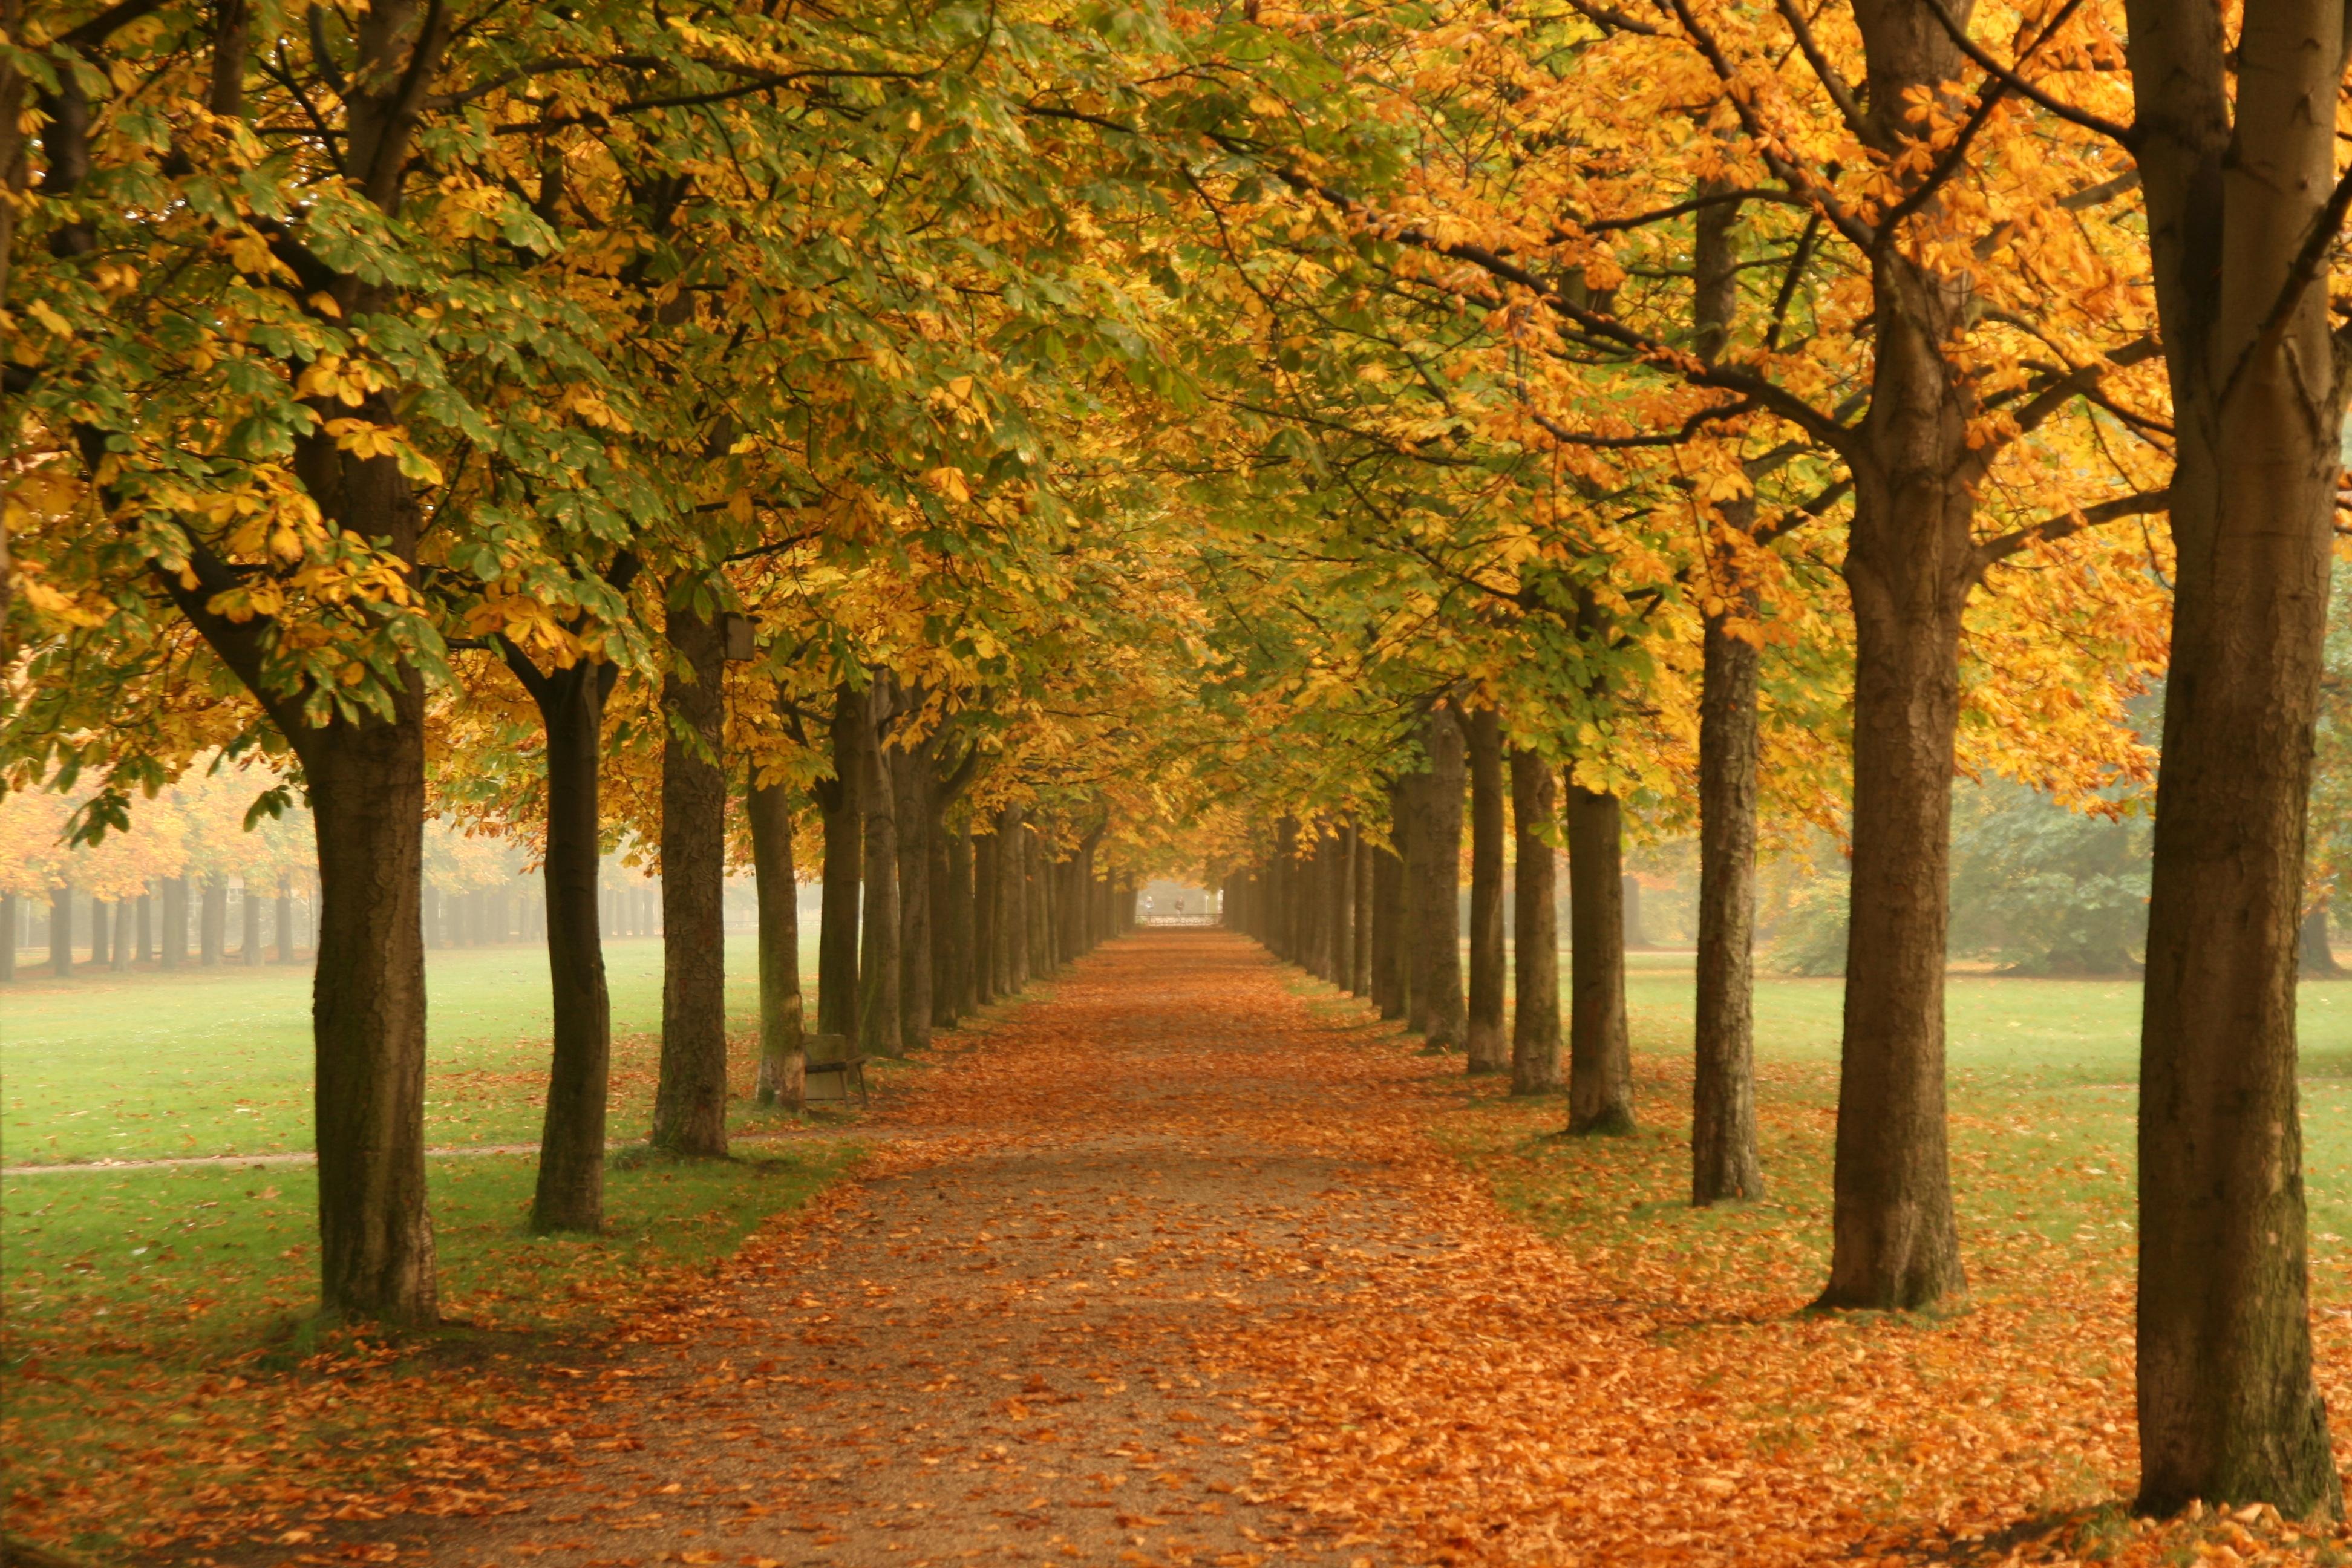 Description Autumn trees in Dresdenjpg 3888x2592